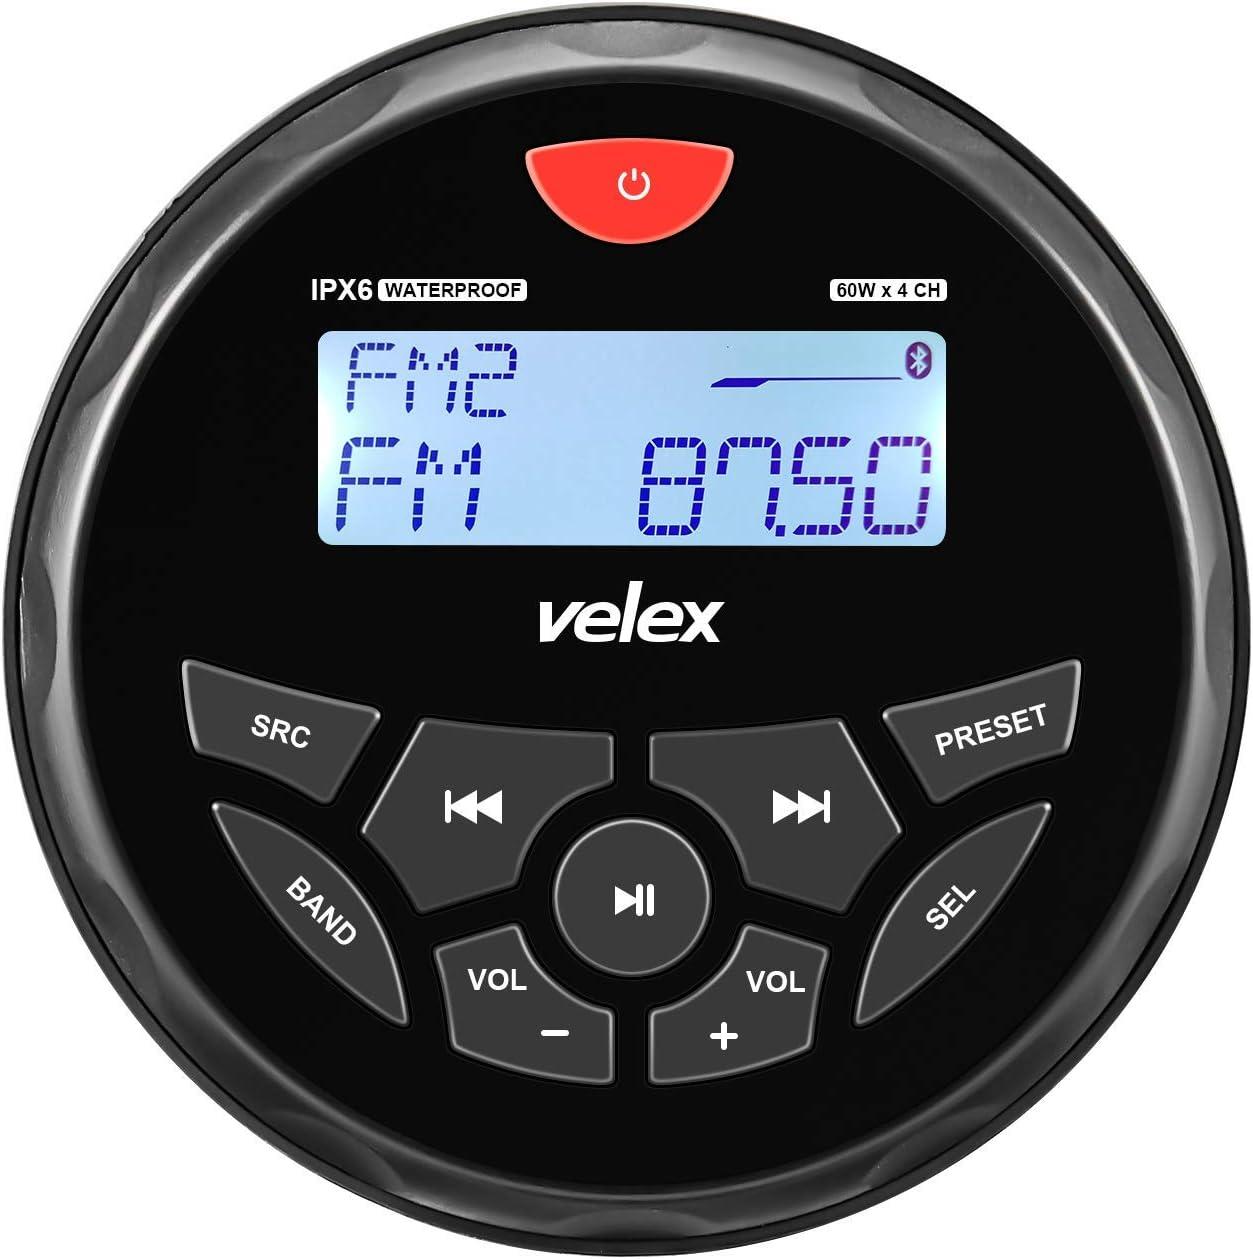 Boat Bluetooth Marine Stereo Radio Boat Radio AM FM Tuner Bluetooth Streaming Music Digital Media on Boats Golf Cart ATV UTV and Spa Hot Tubs